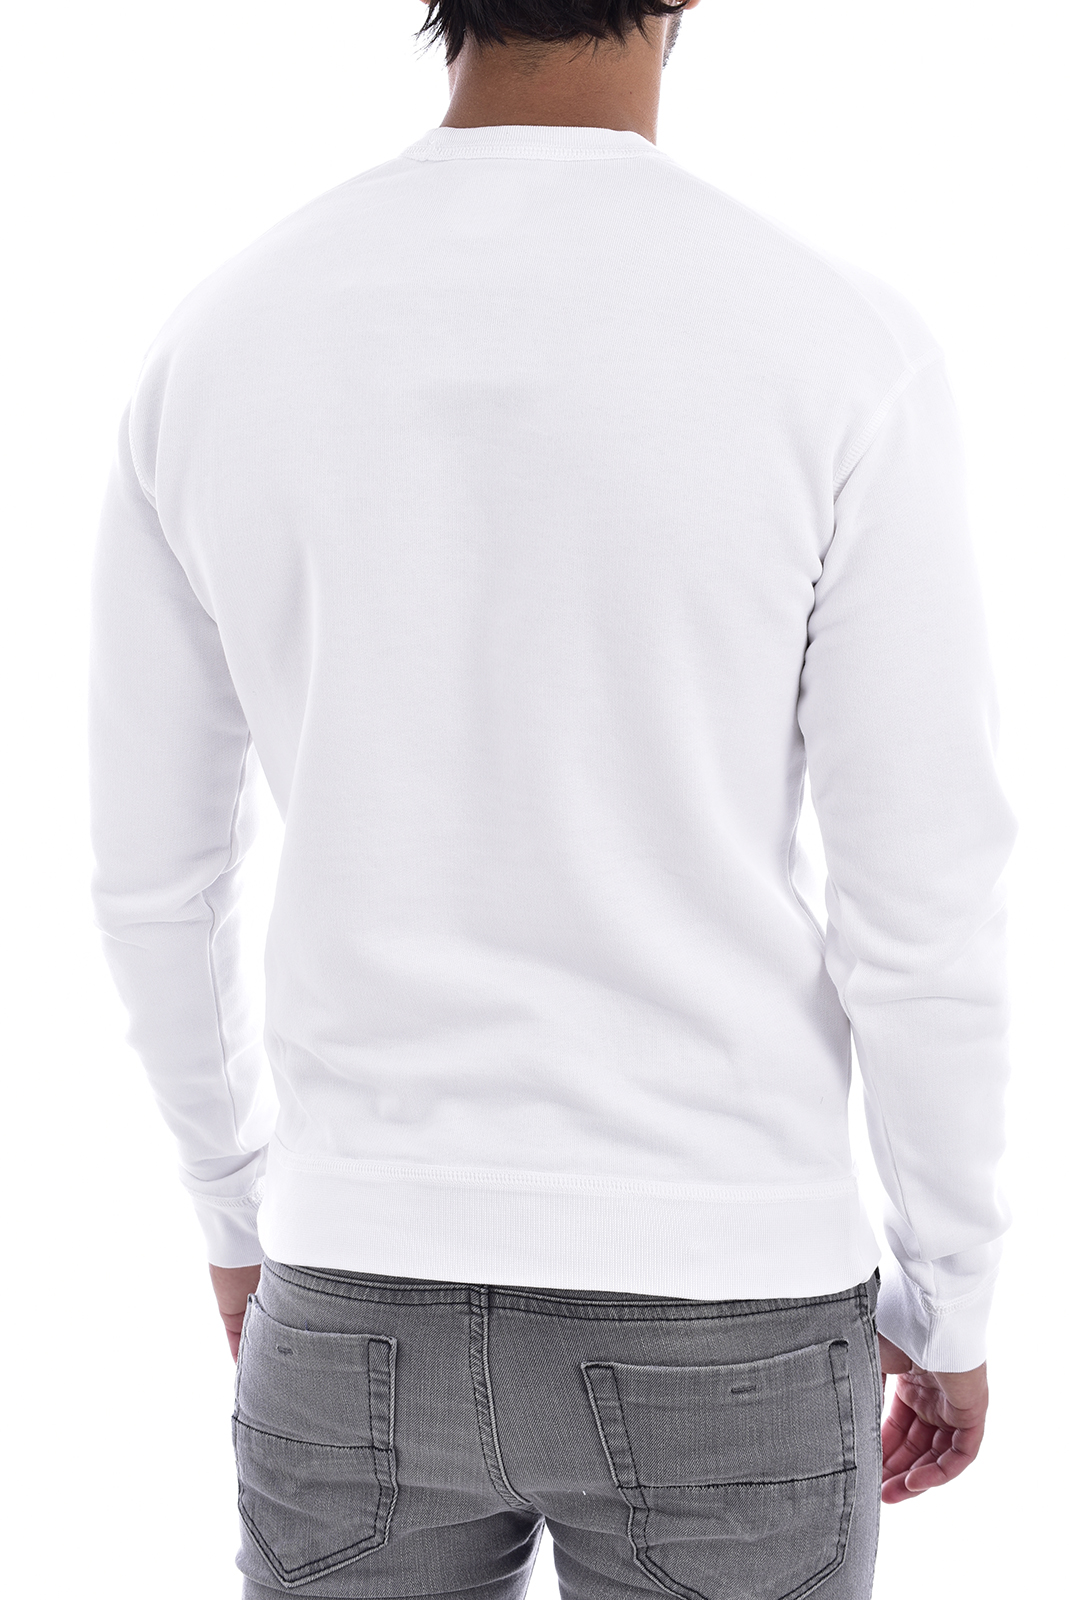 Sweatshirts  Dsquared2 S74GU0157 100 BLANC